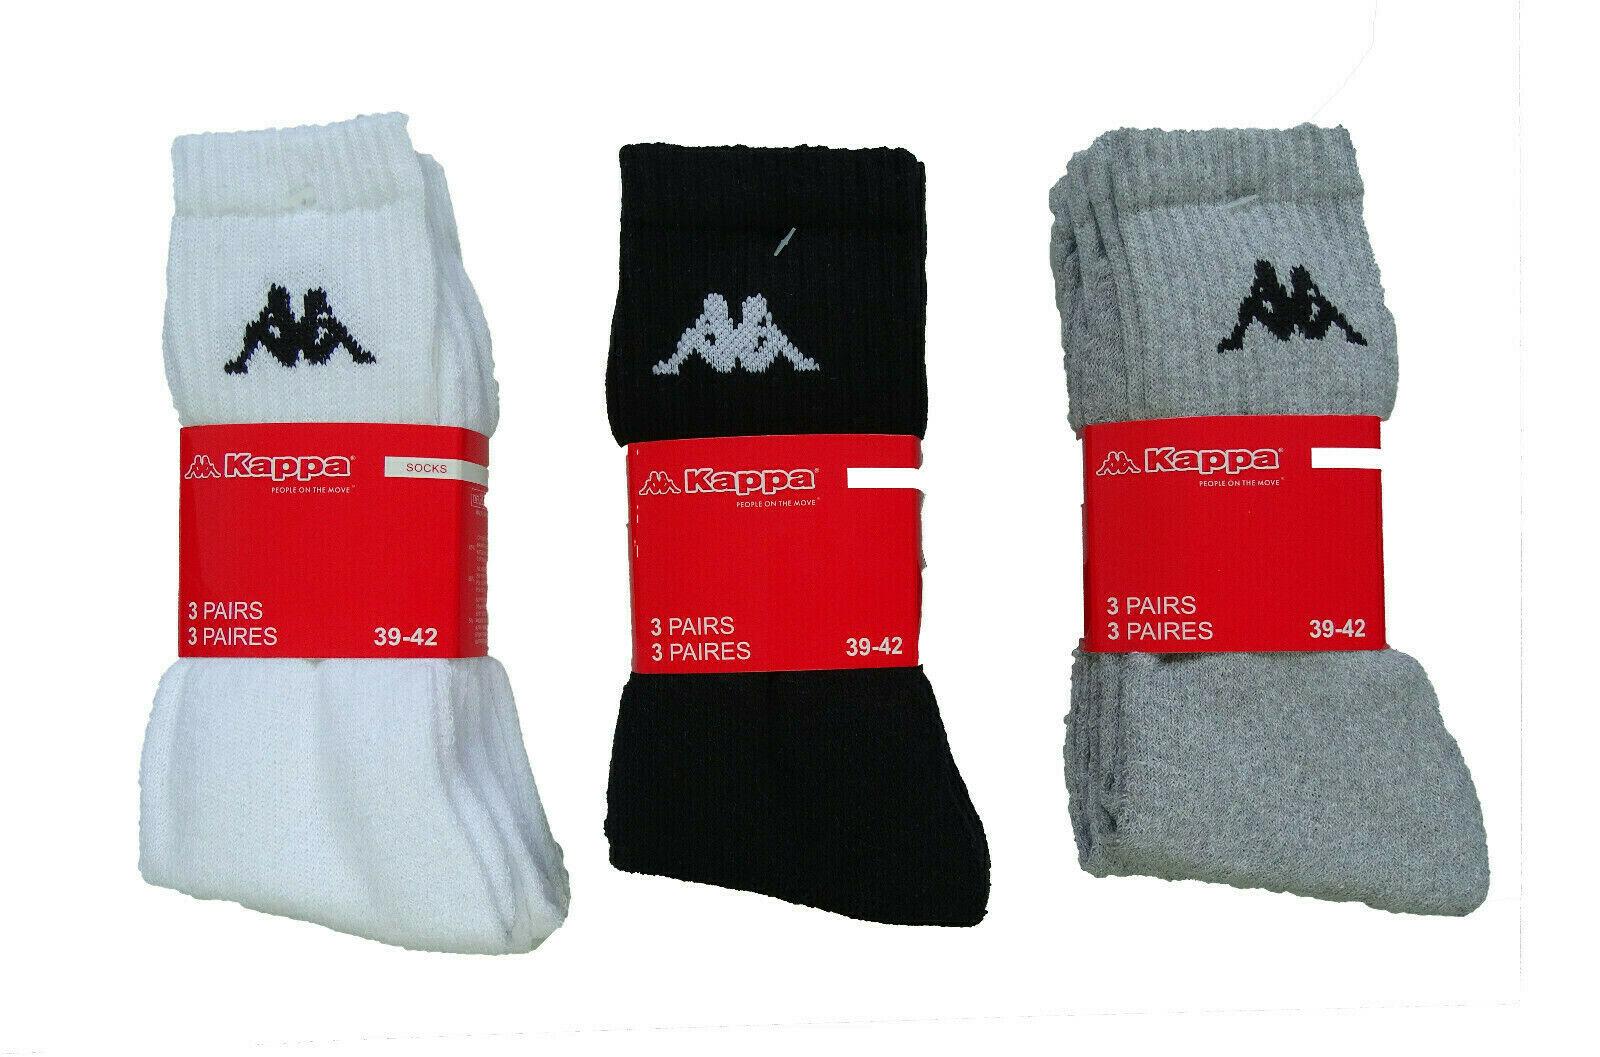 Kappa 9 bis 18 Paar Sportsocken Tennissocken Arbeitssocken Freizeitsocken Socken